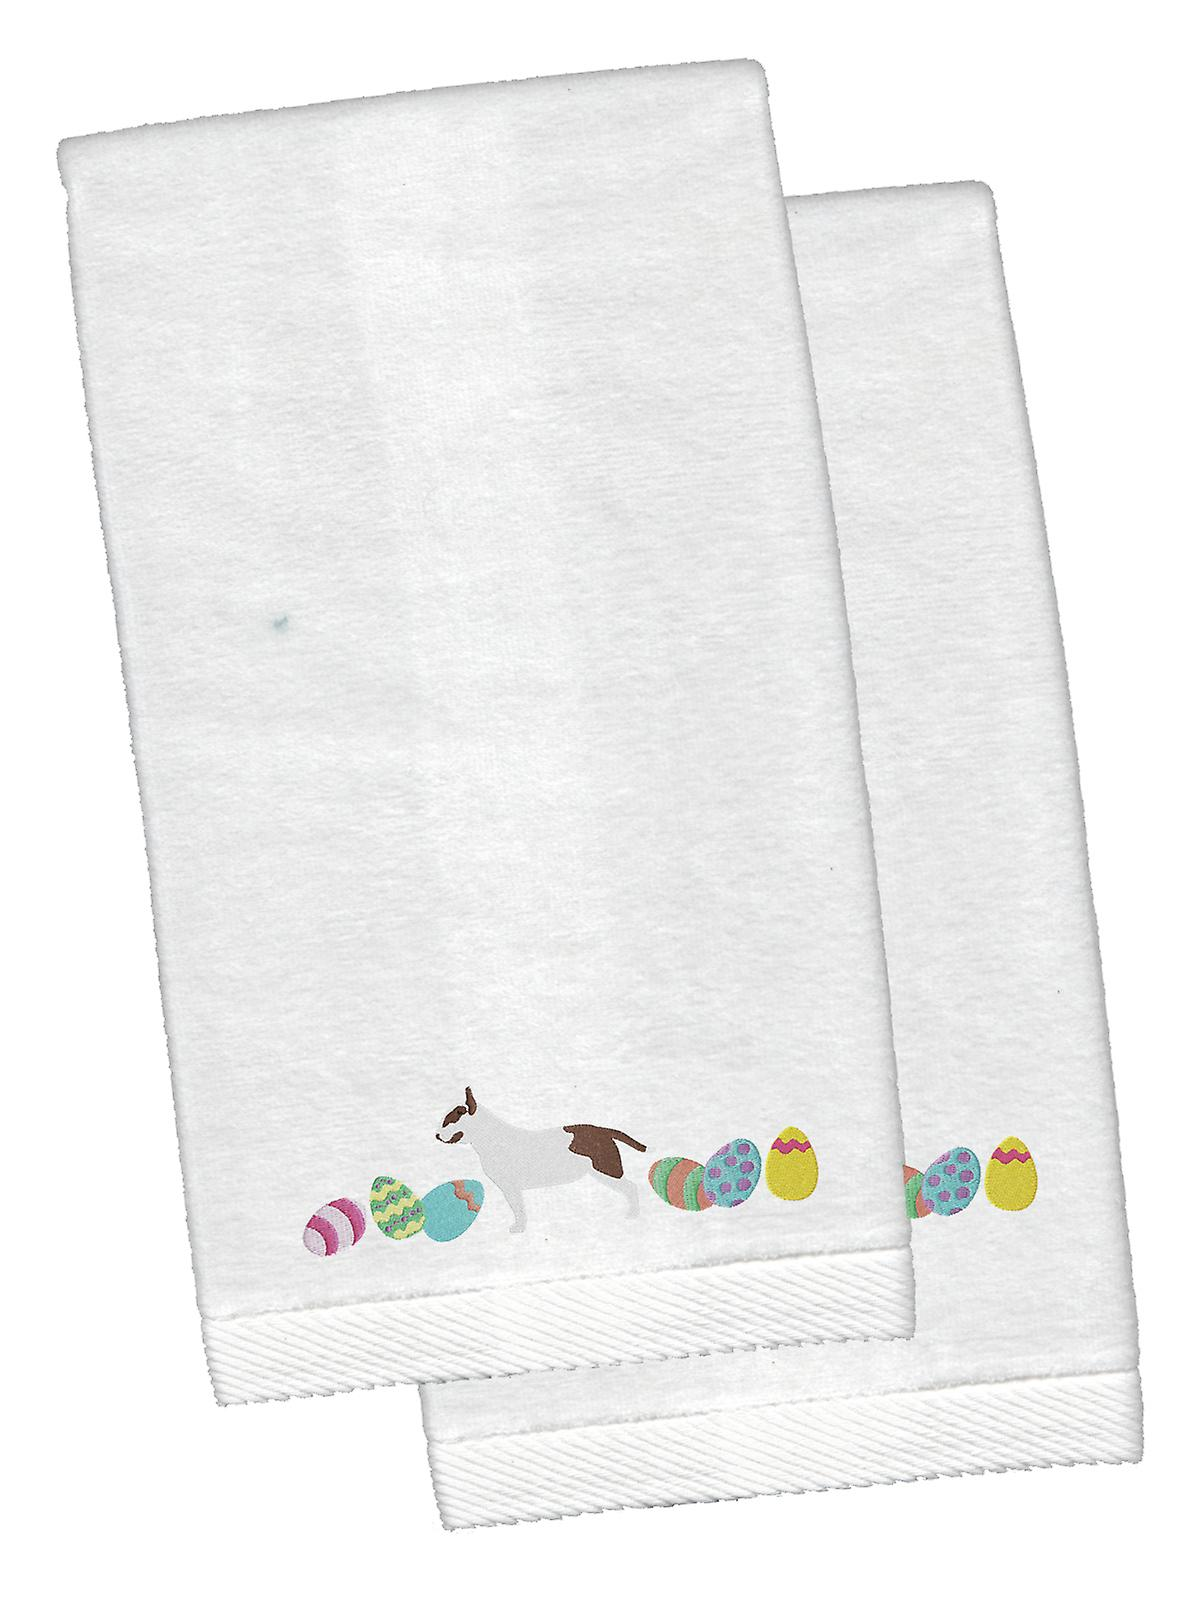 Bull Terrier Easter White Embroidered Plush Hand Towel Set of 2